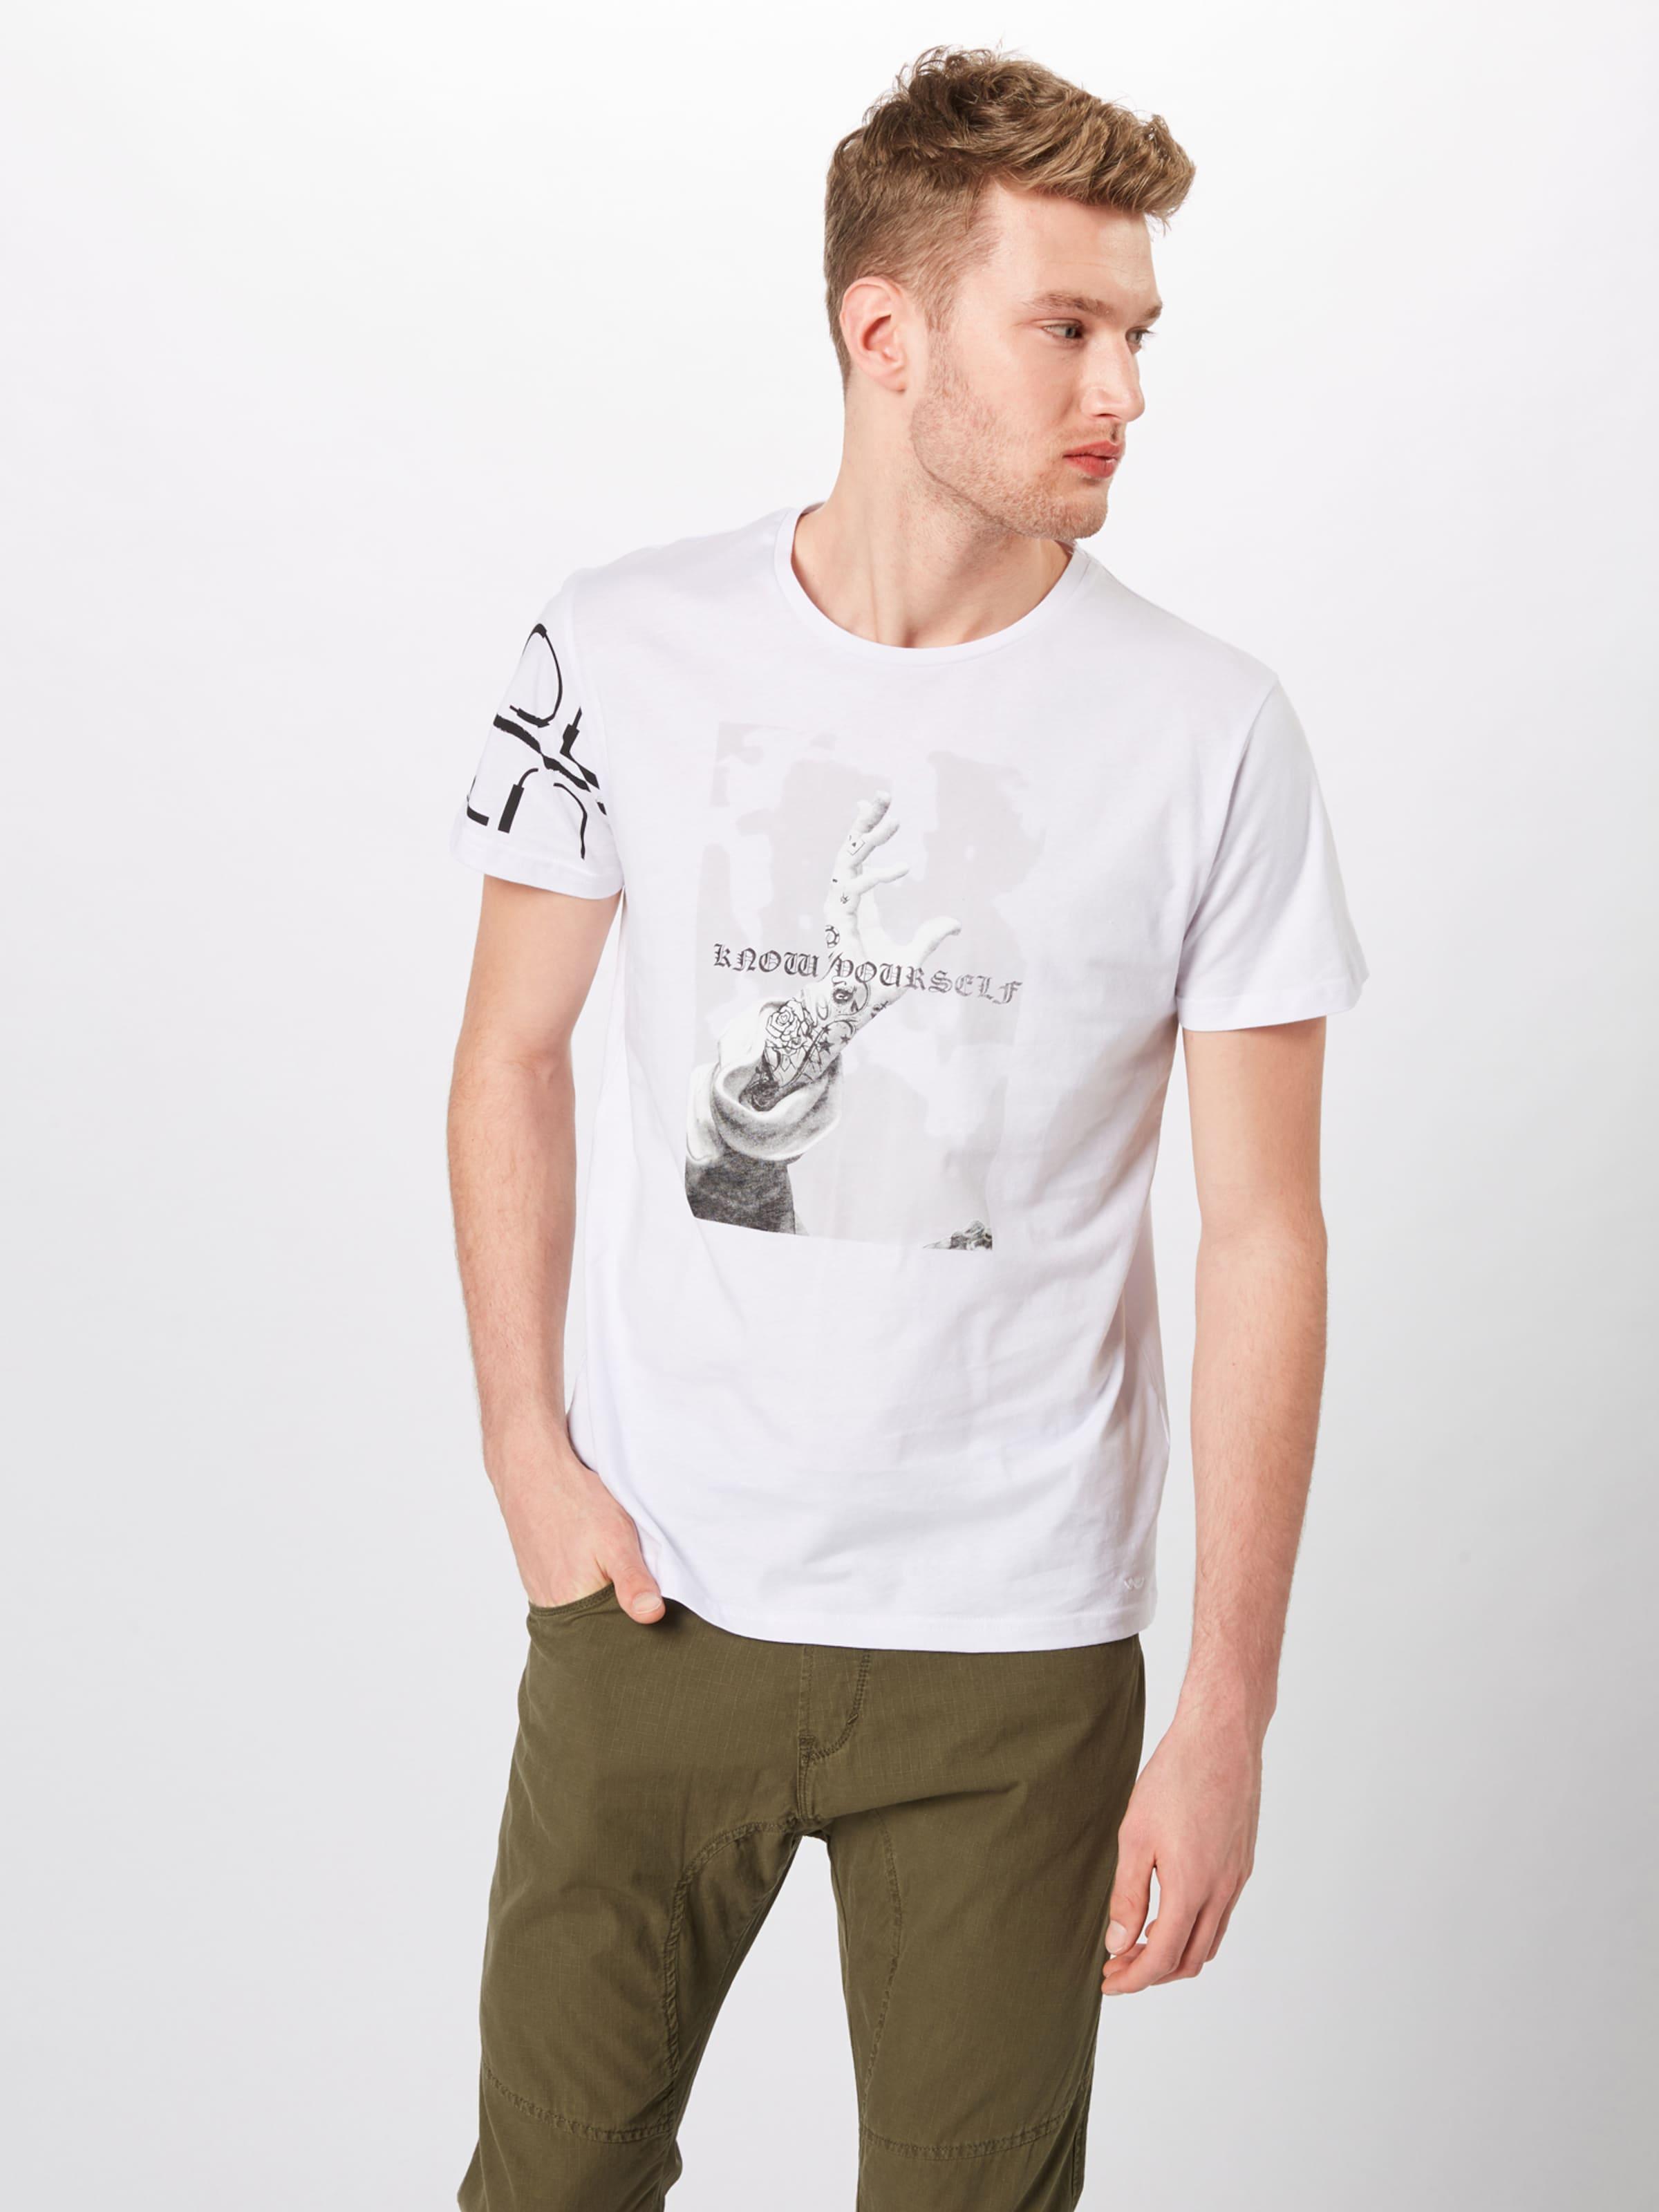 GrisBlanc shirt En Ltb 'senefo s' T T v8NnwmPy0O